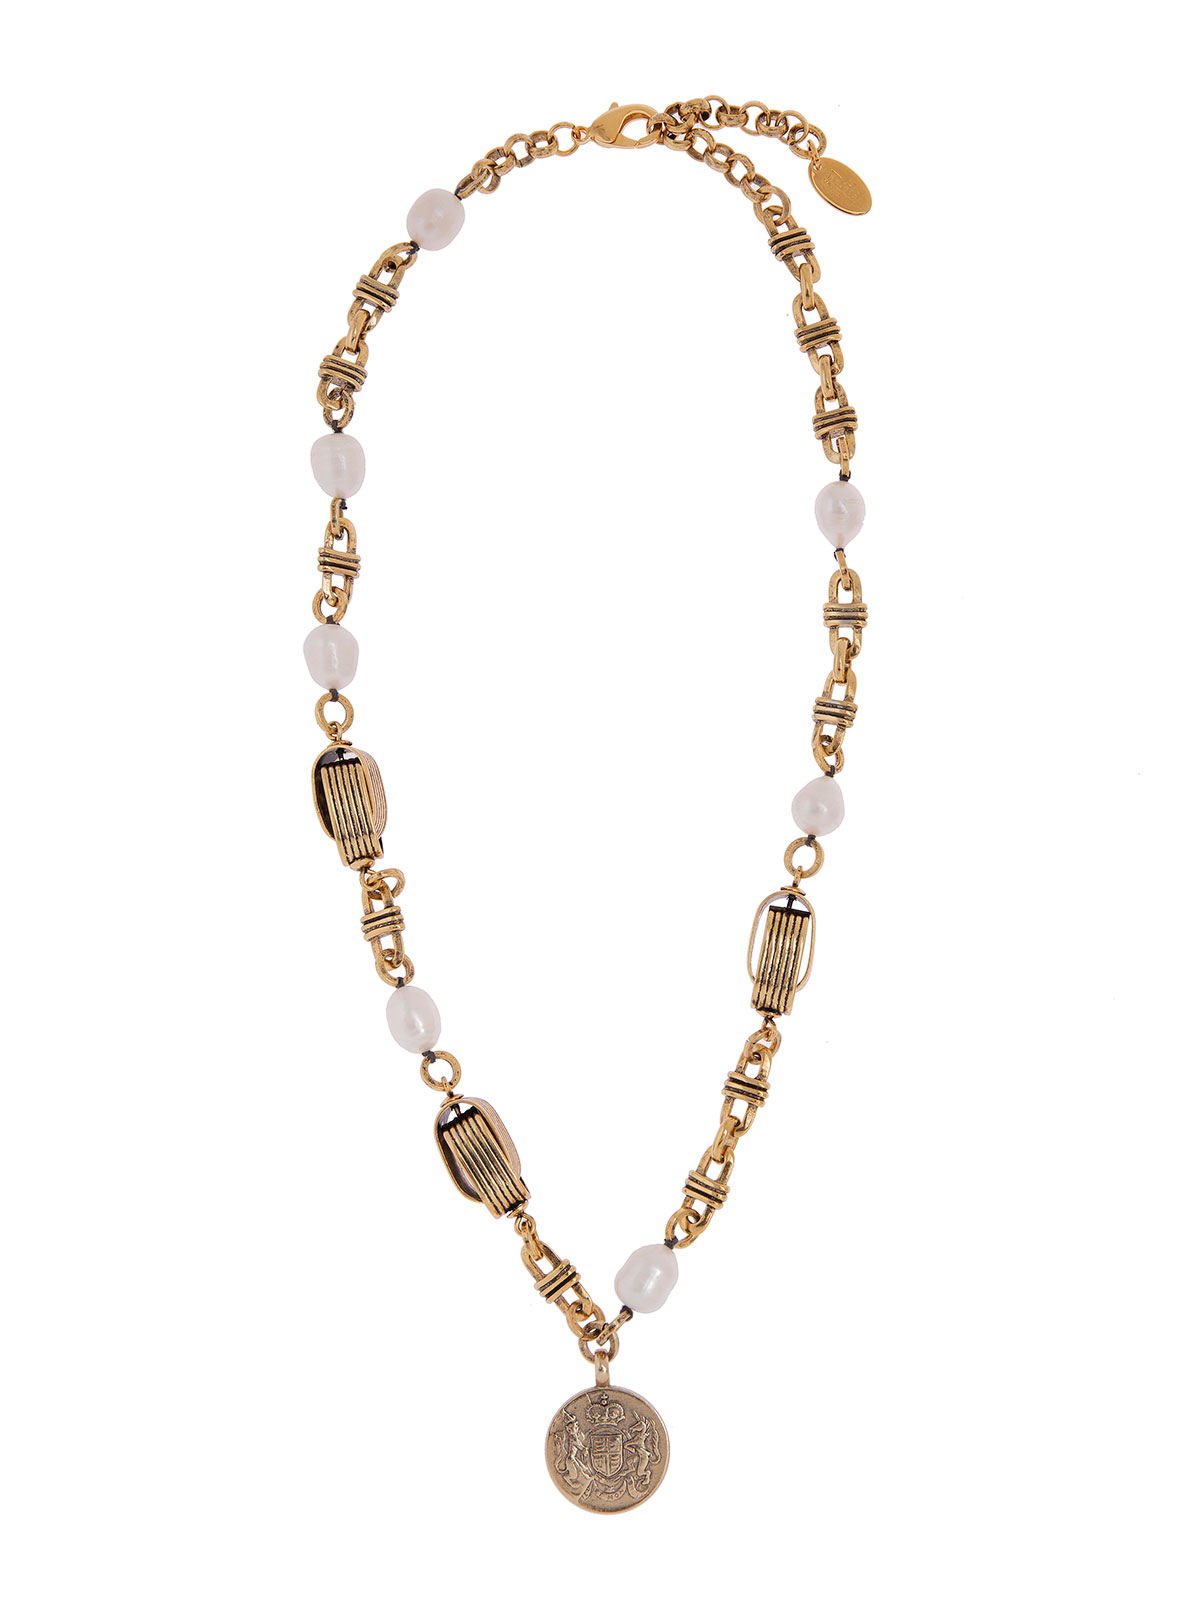 Collana con moneta e perle di fiume